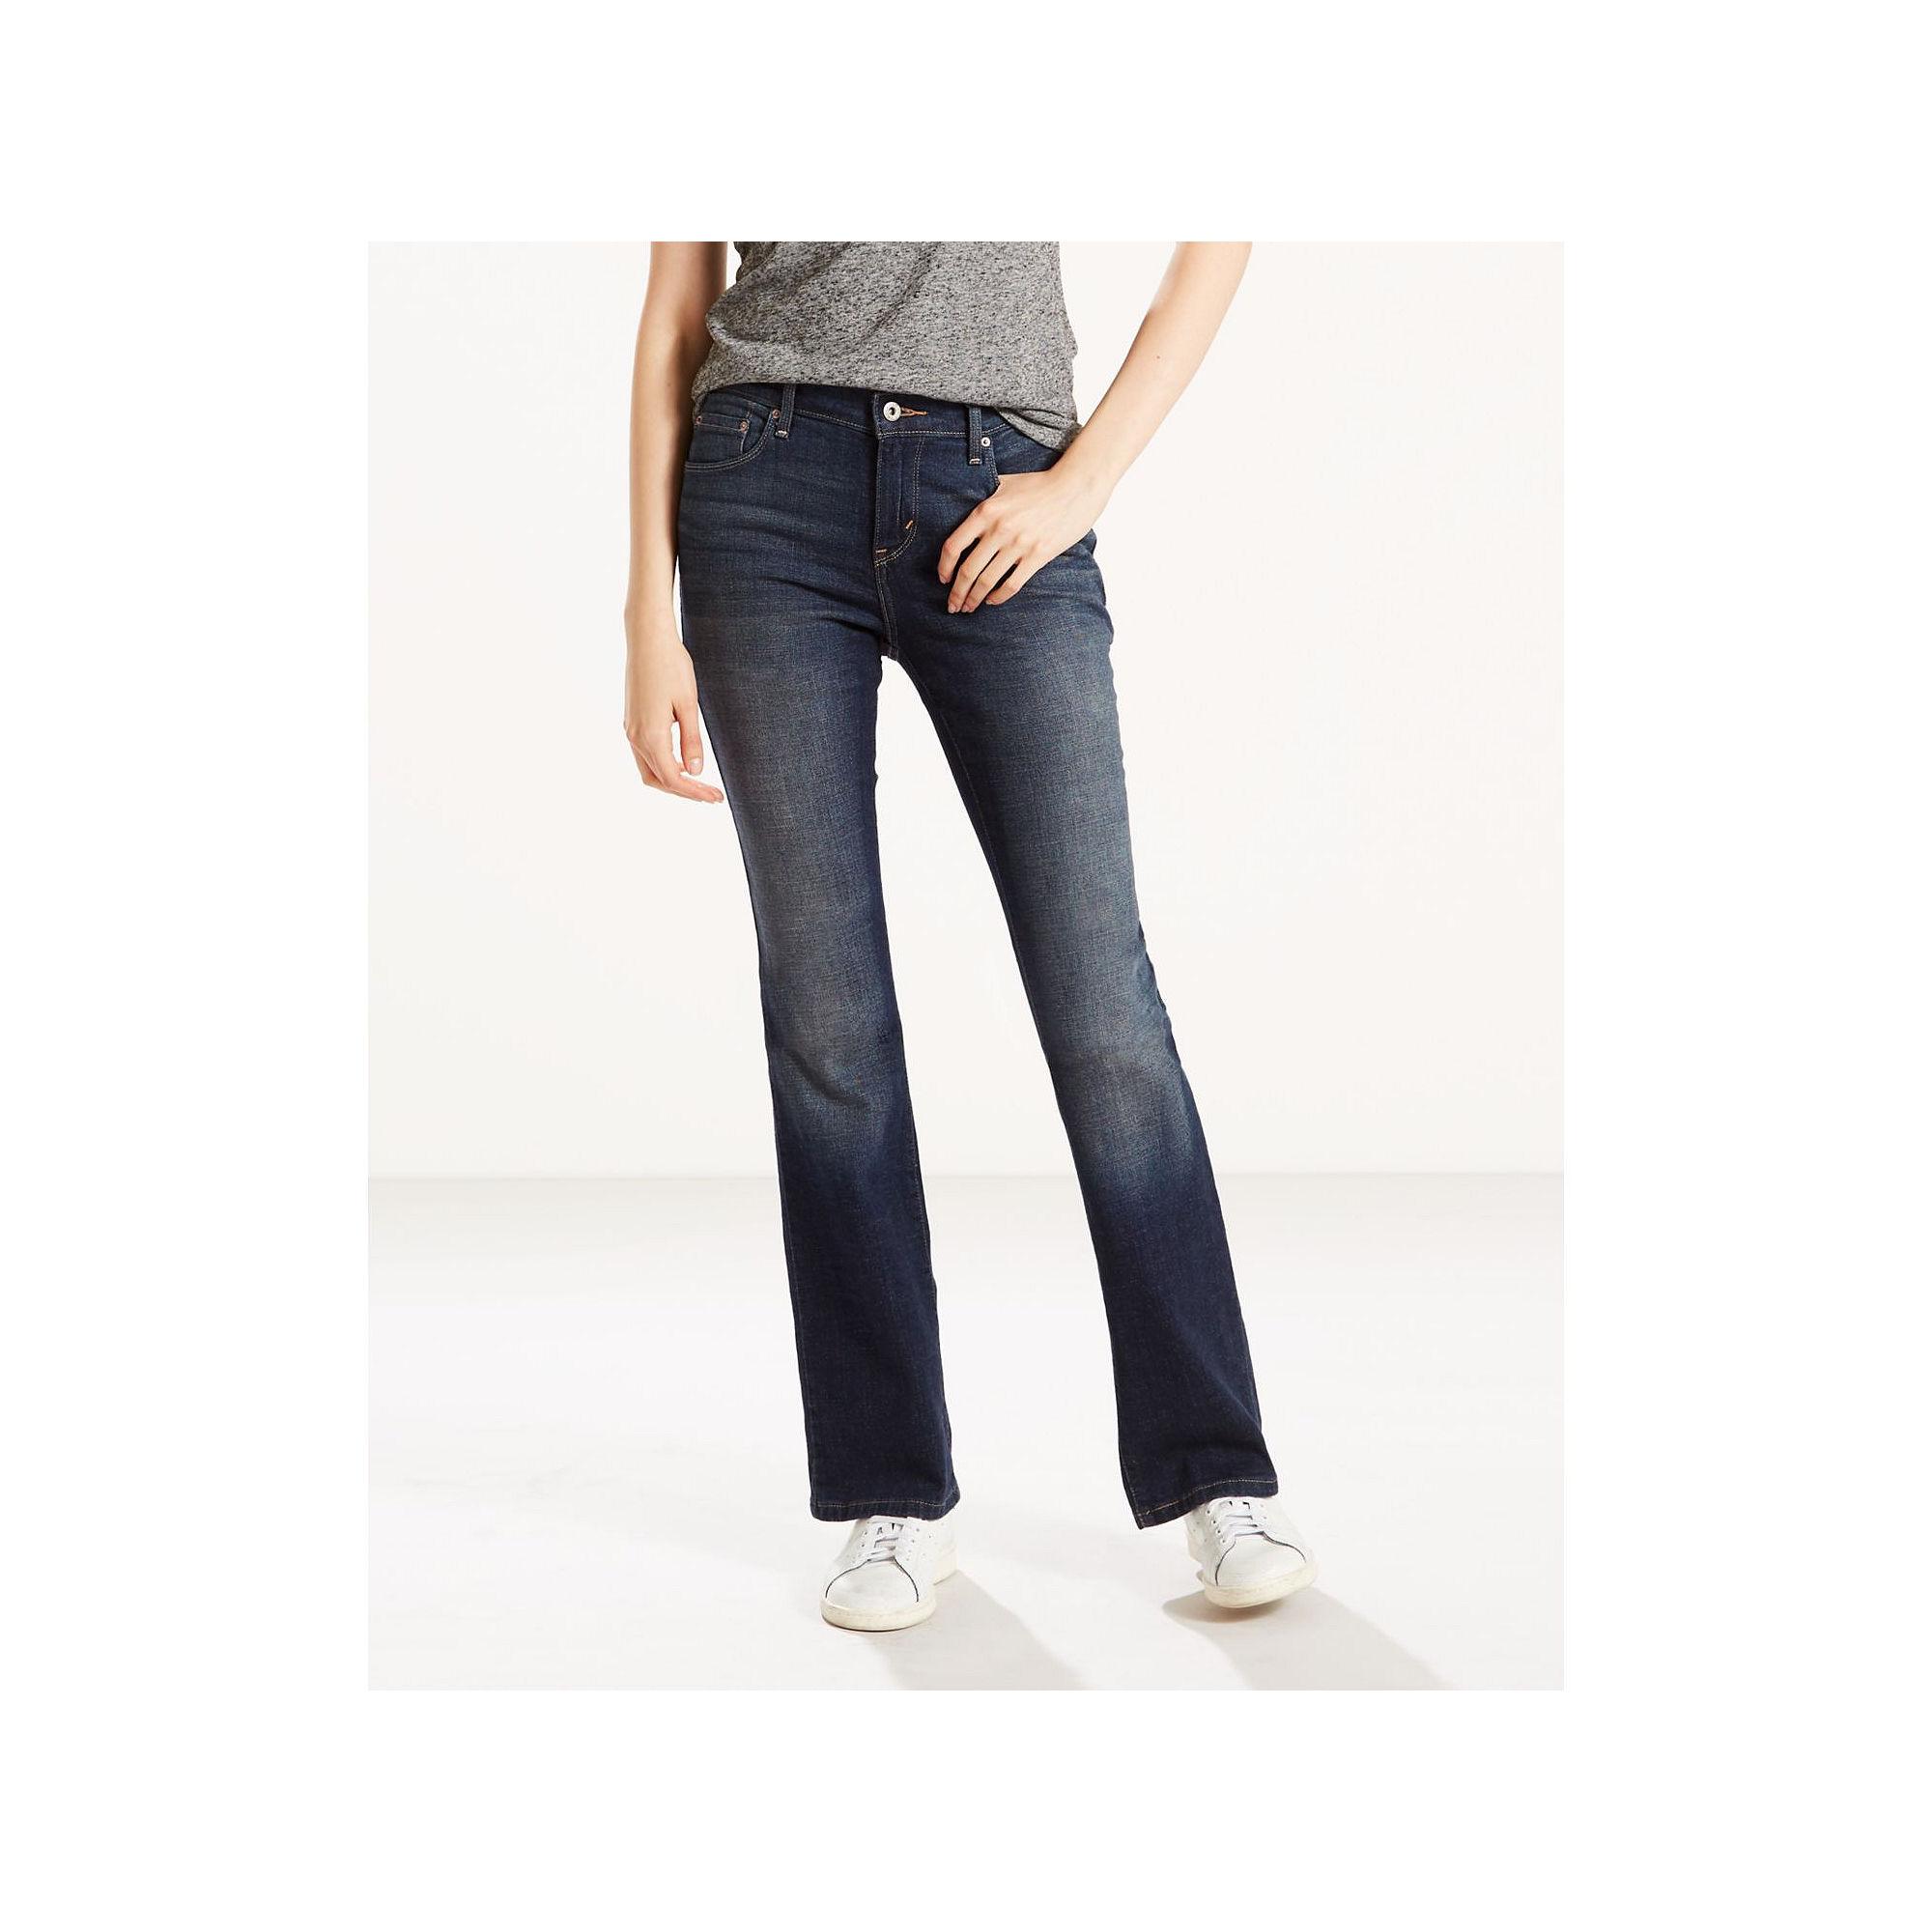 "Levi's 515"" Bootcut Jeans"